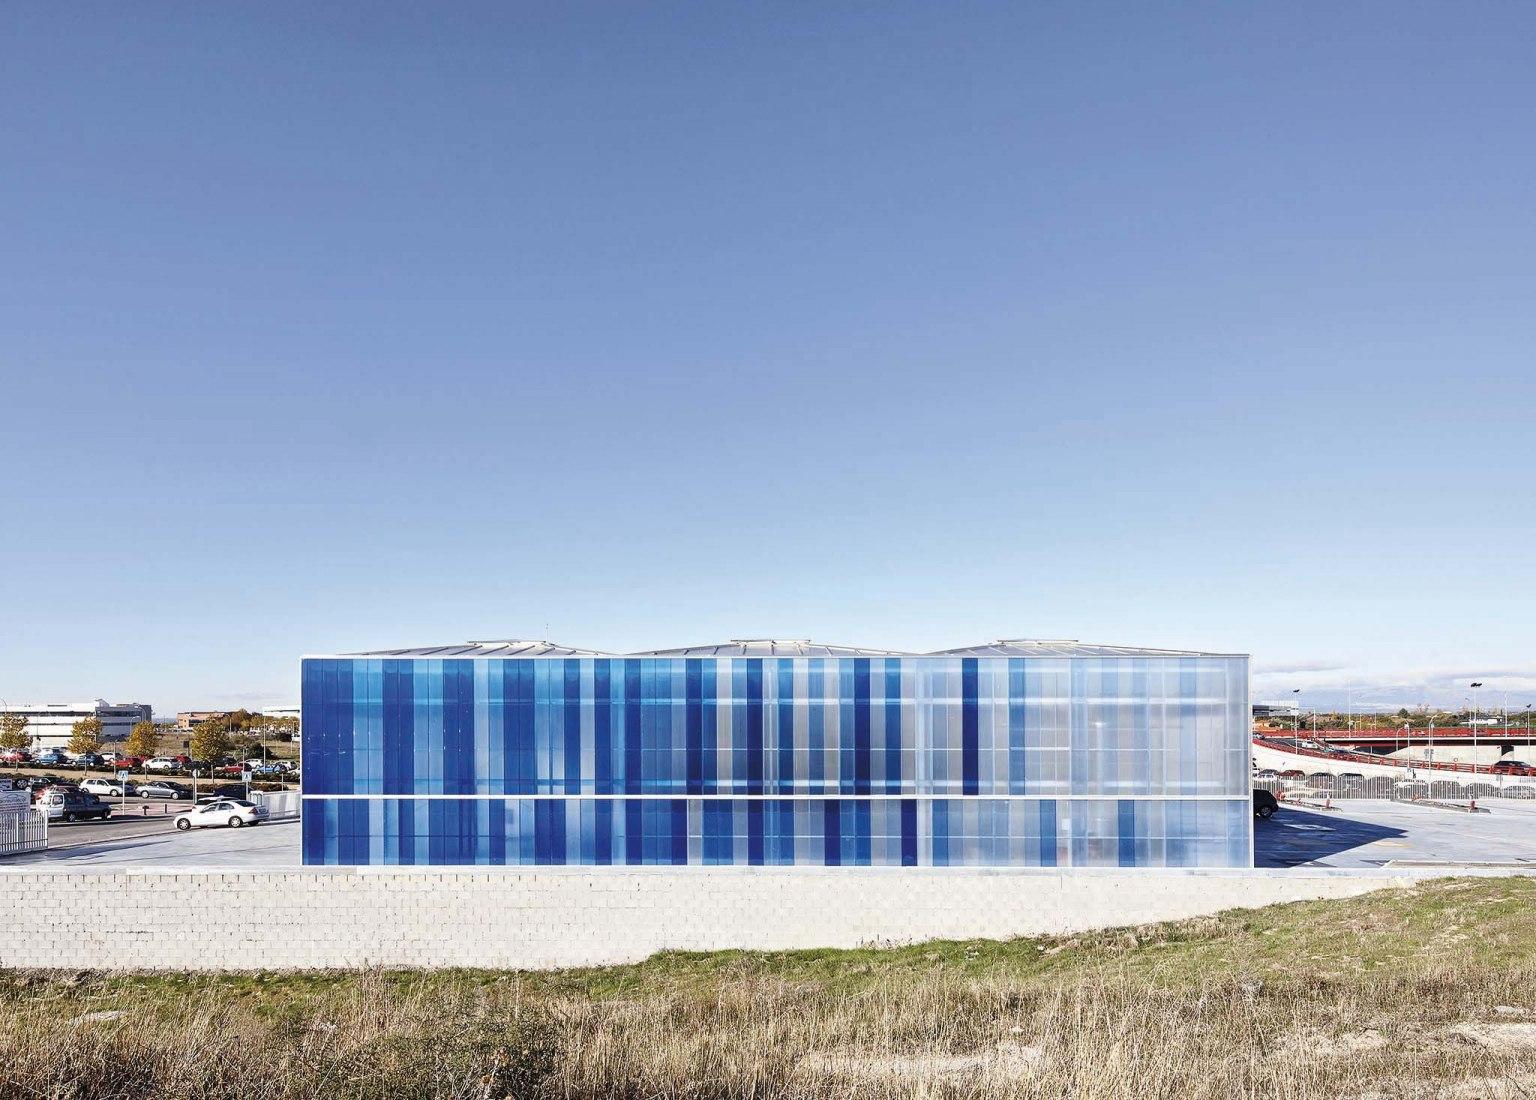 Car service building by Sau Taller d'Arquitectura. Photograph by José Hevia